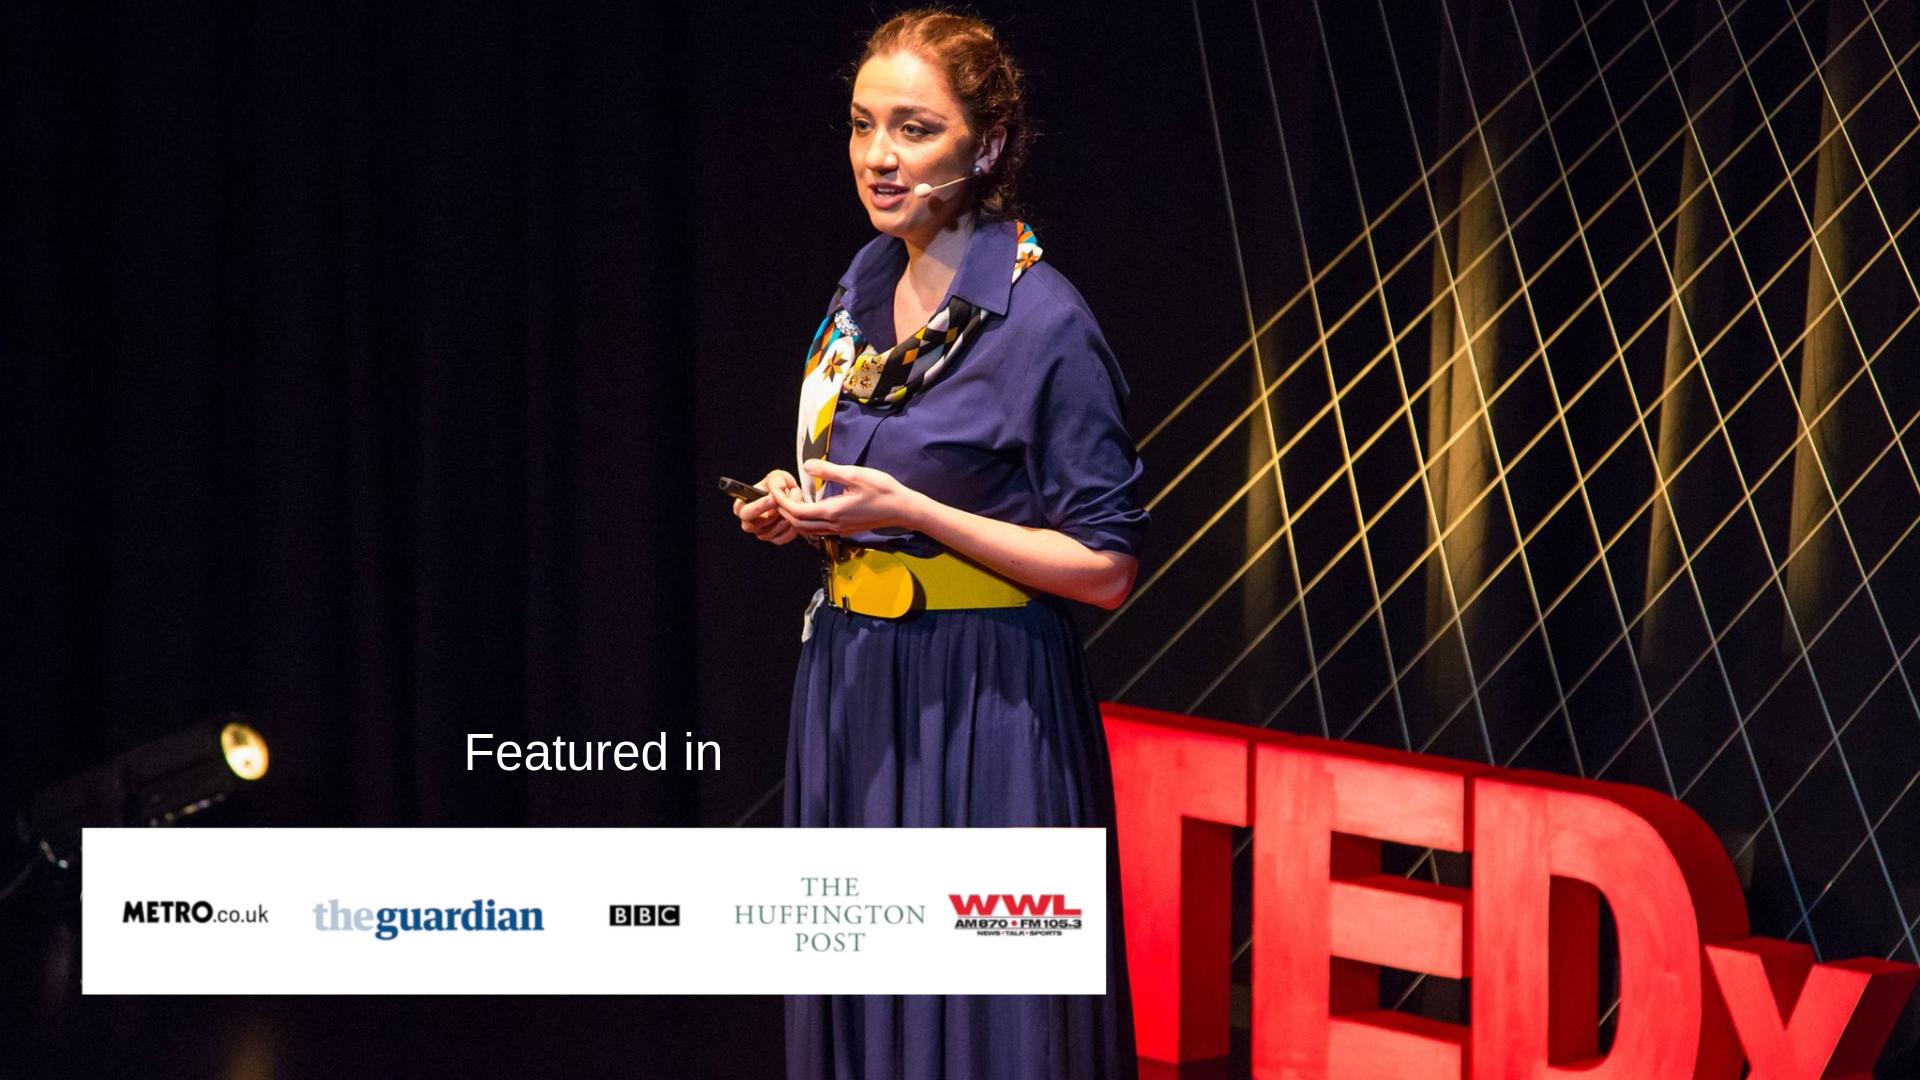 Dating apocalypse Frankfurt: a talk by a TEDx speaker